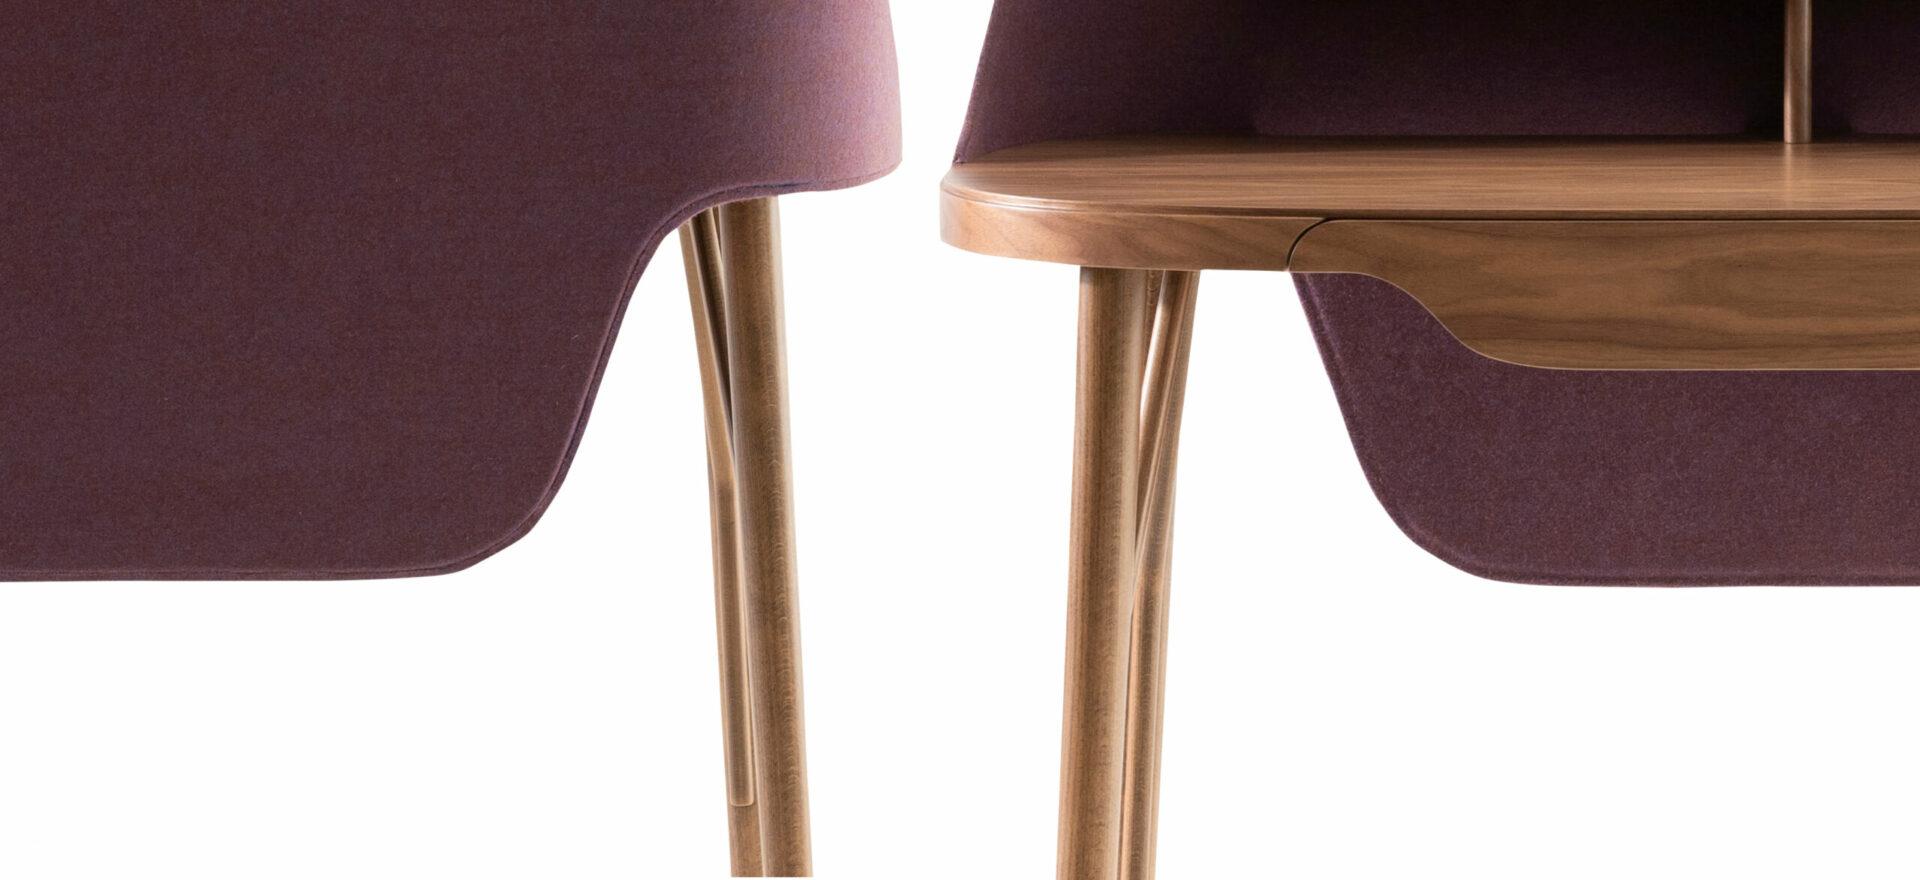 LUNEDI_Addo_workstation_home office_details_sound-absorbing fabric_Mario Trimarchi Design